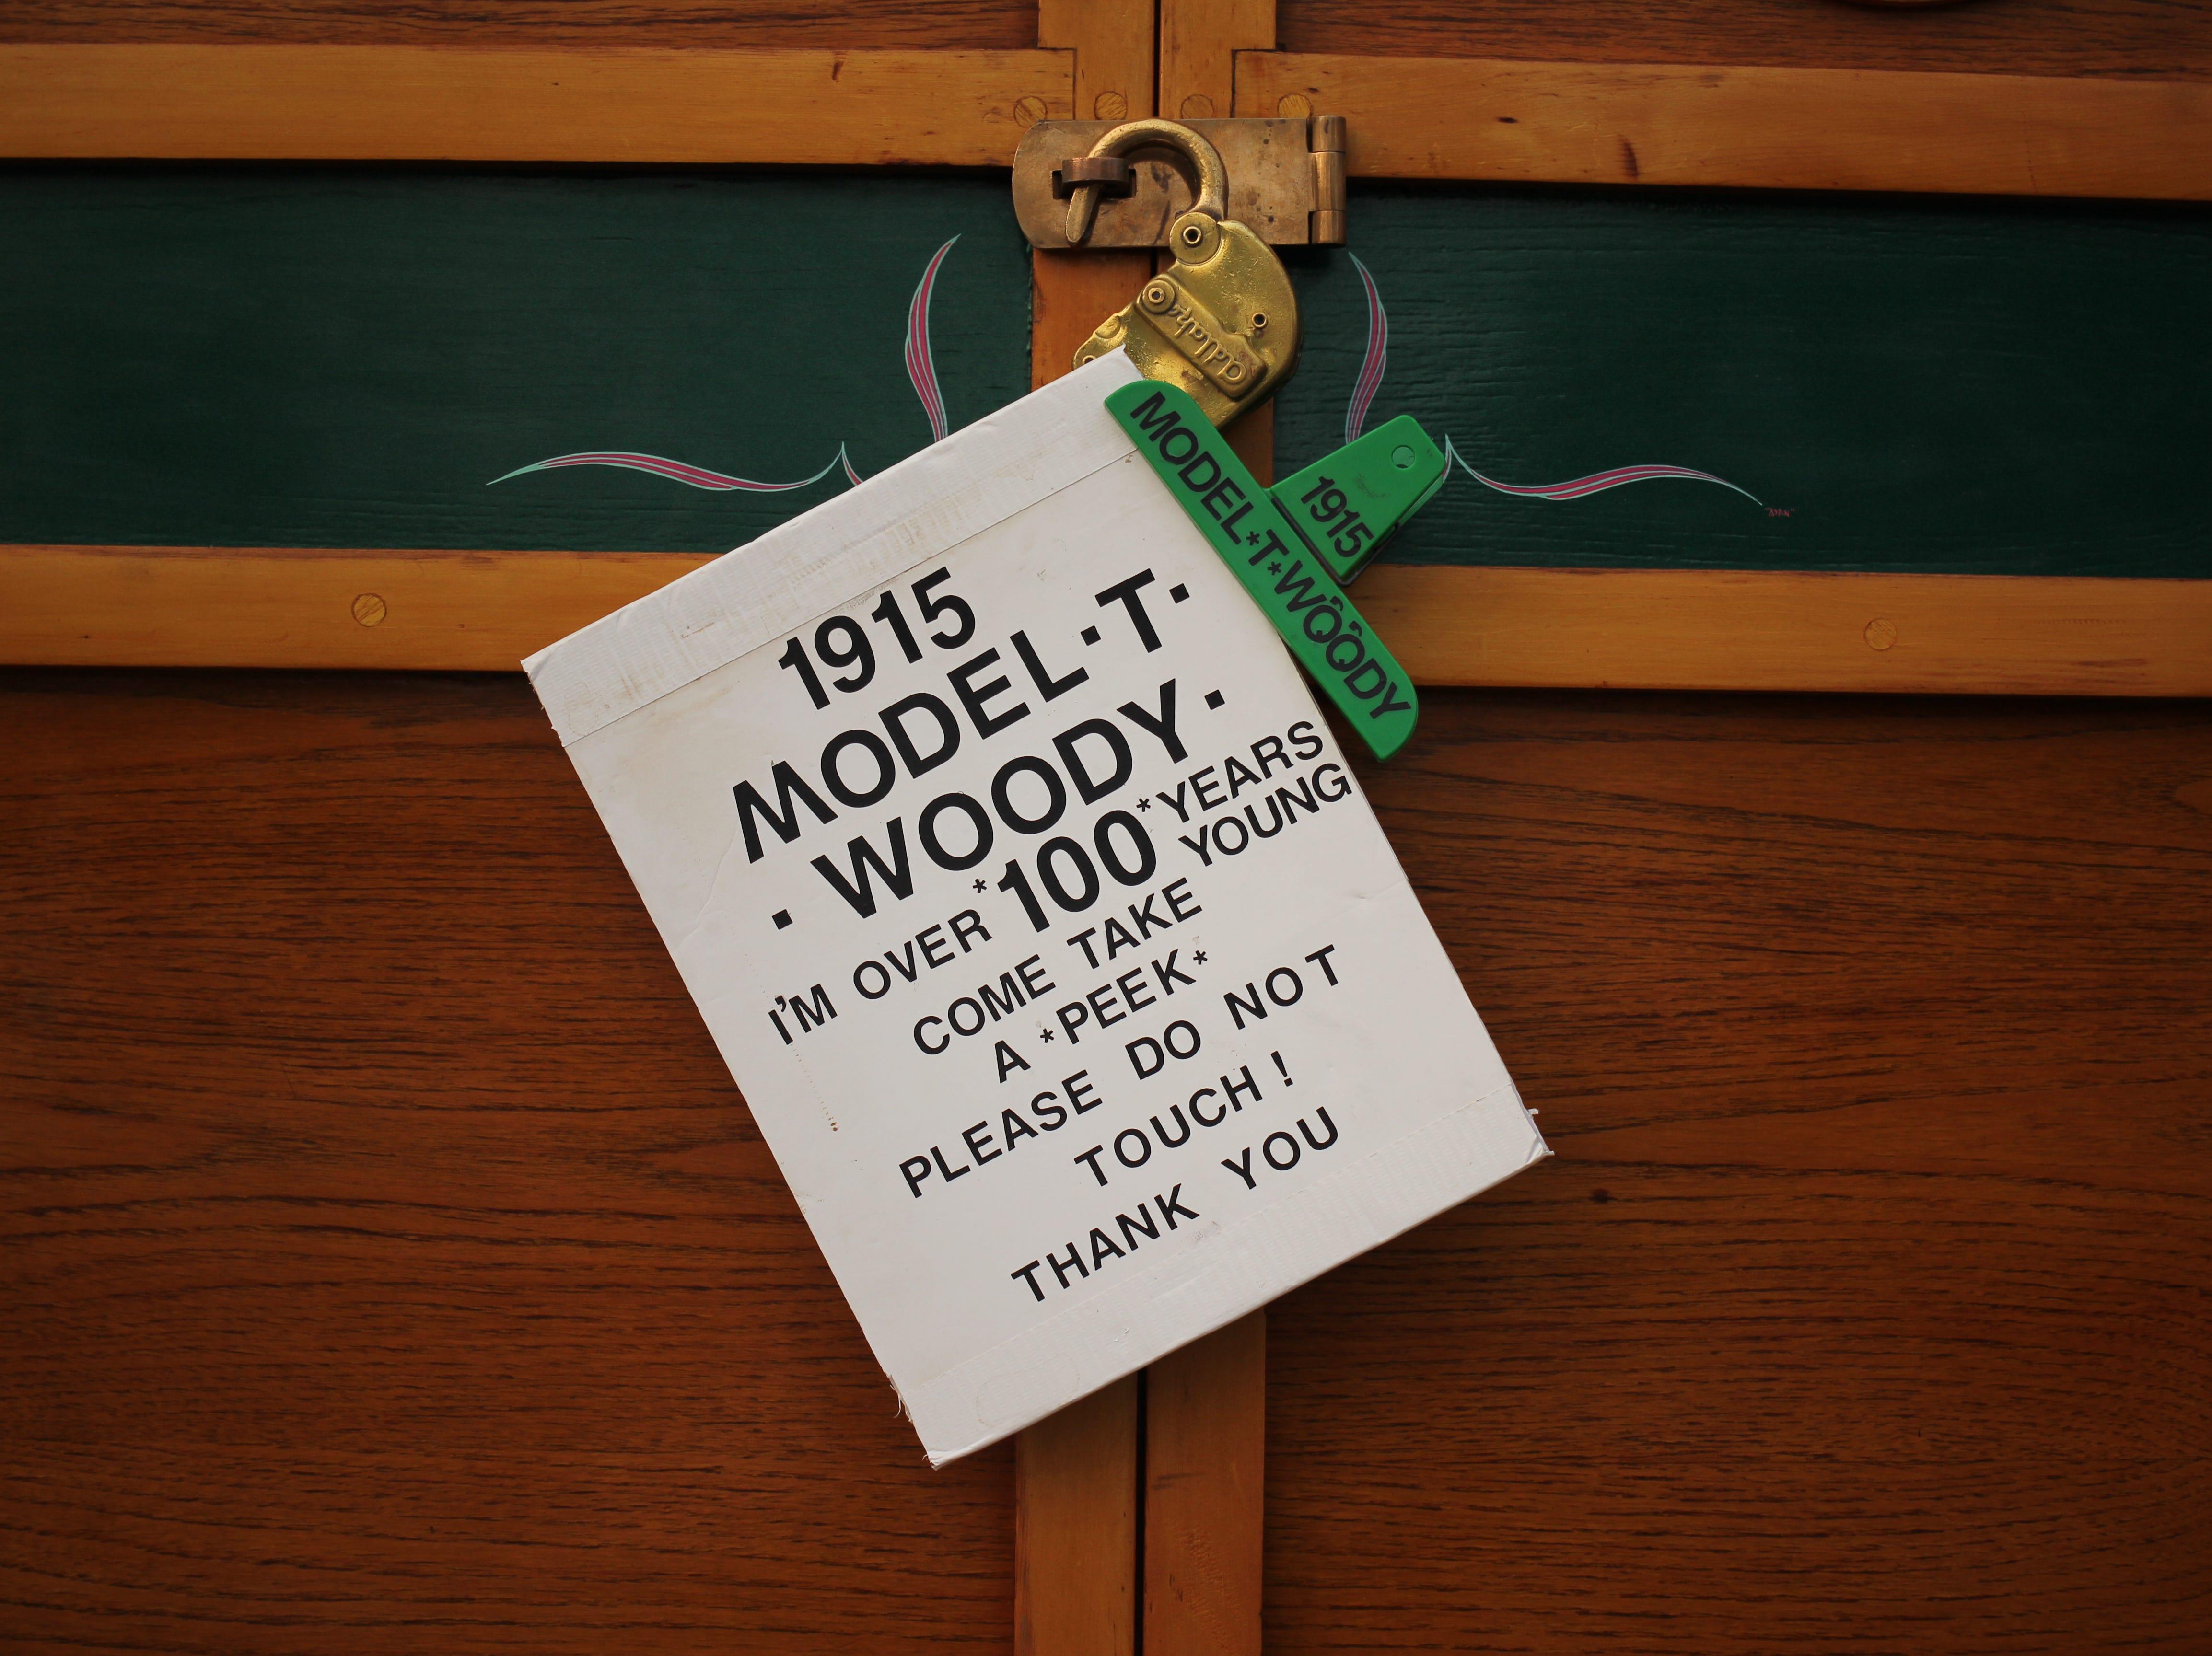 1915 Model T Woody